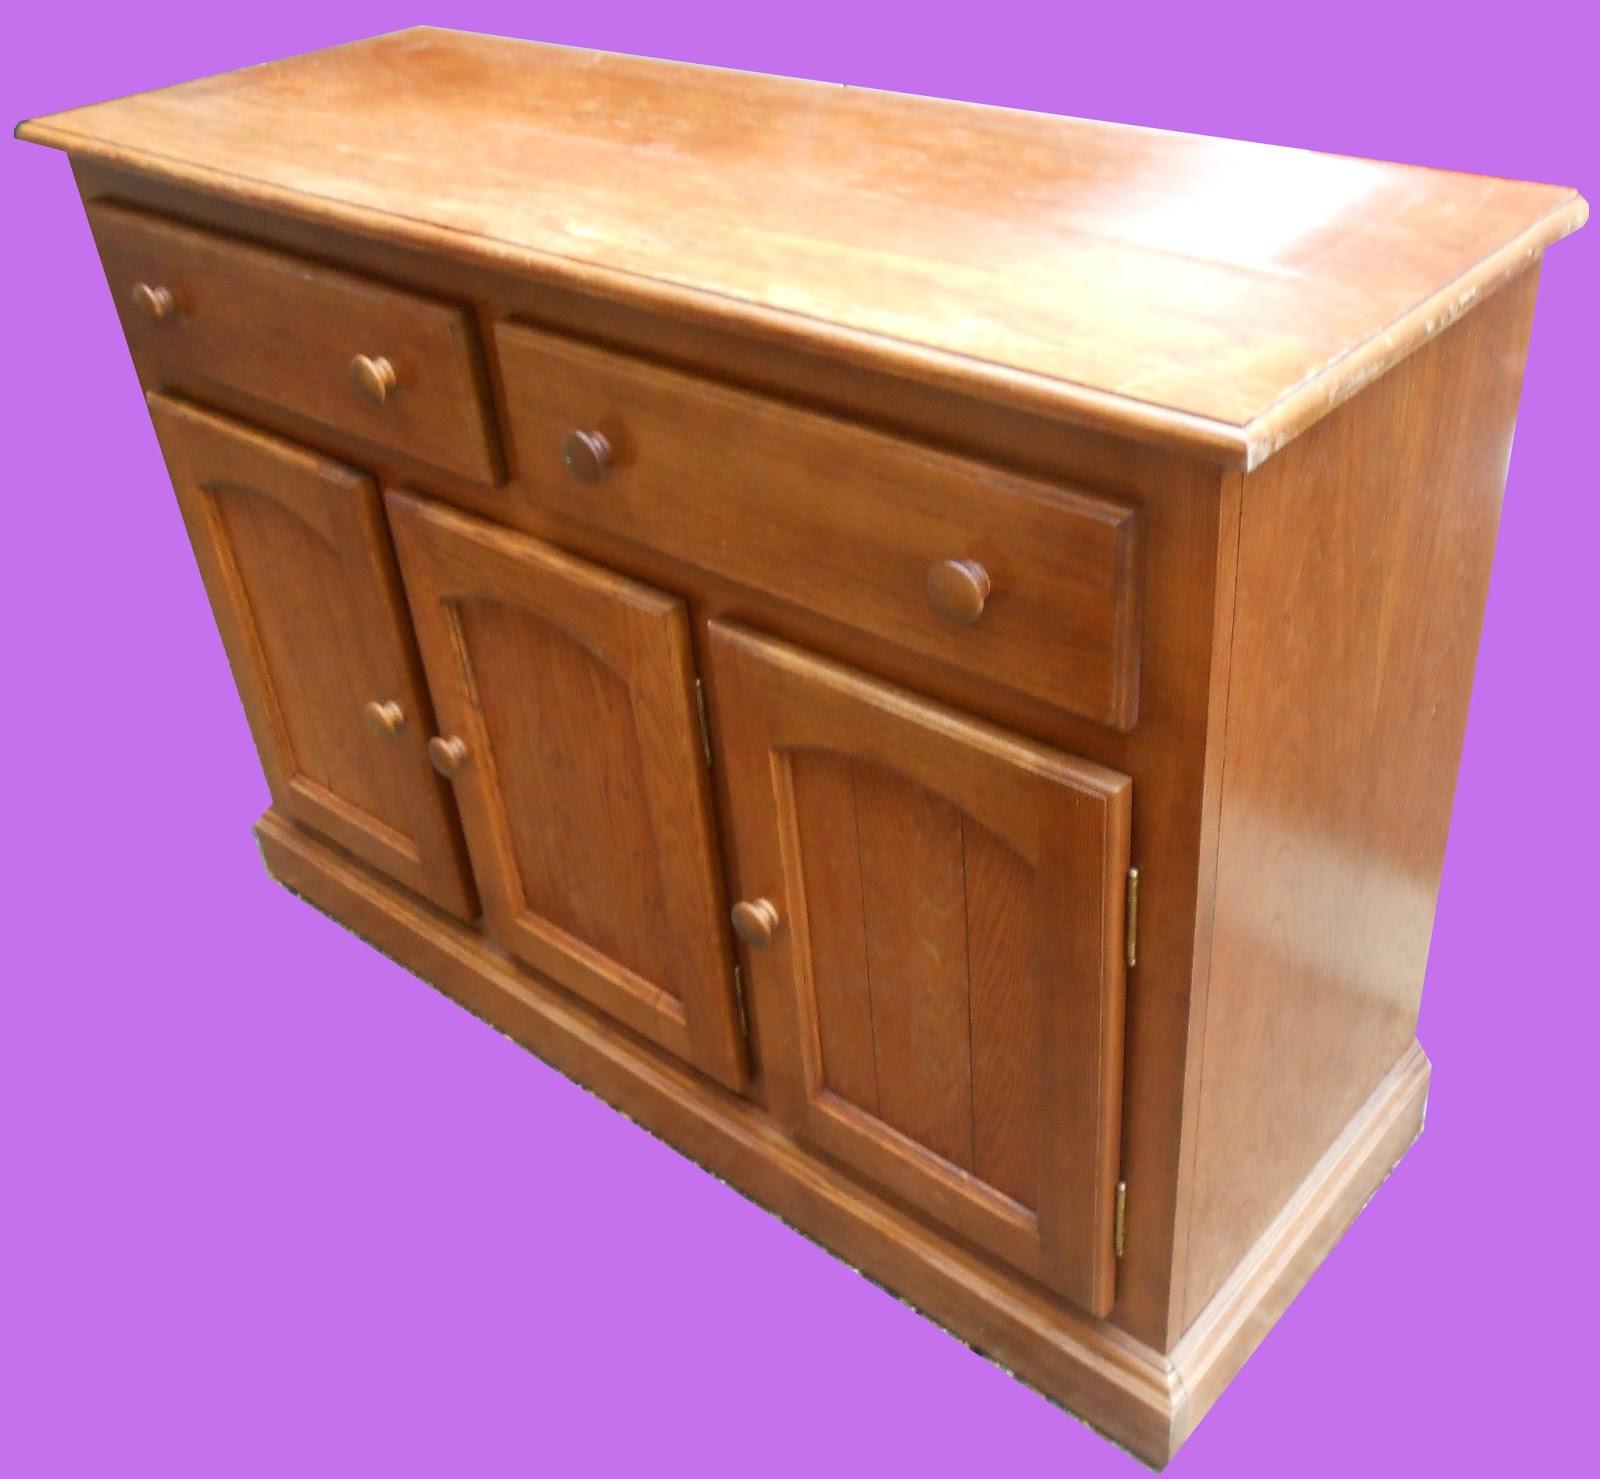 uhuru furniture collectibles oak buffet sold. Black Bedroom Furniture Sets. Home Design Ideas